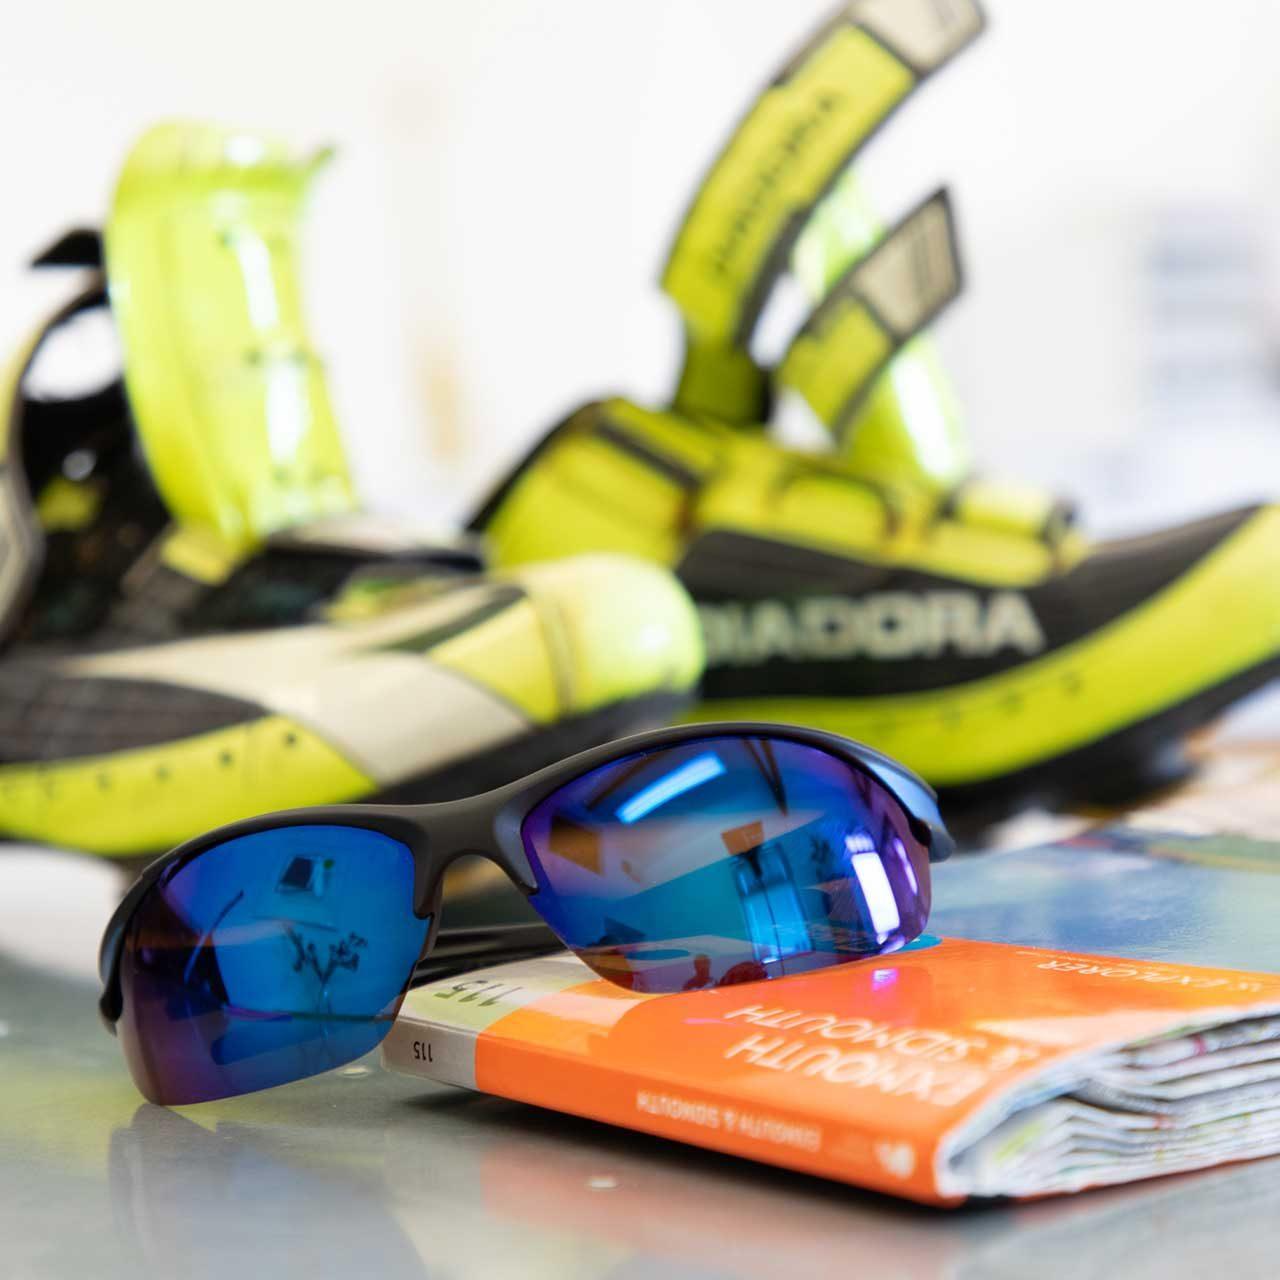 https://robertcamp.co.uk/wp-content/uploads/2020/07/sunglasses-cycling-shoes-map-1280x1280.jpg